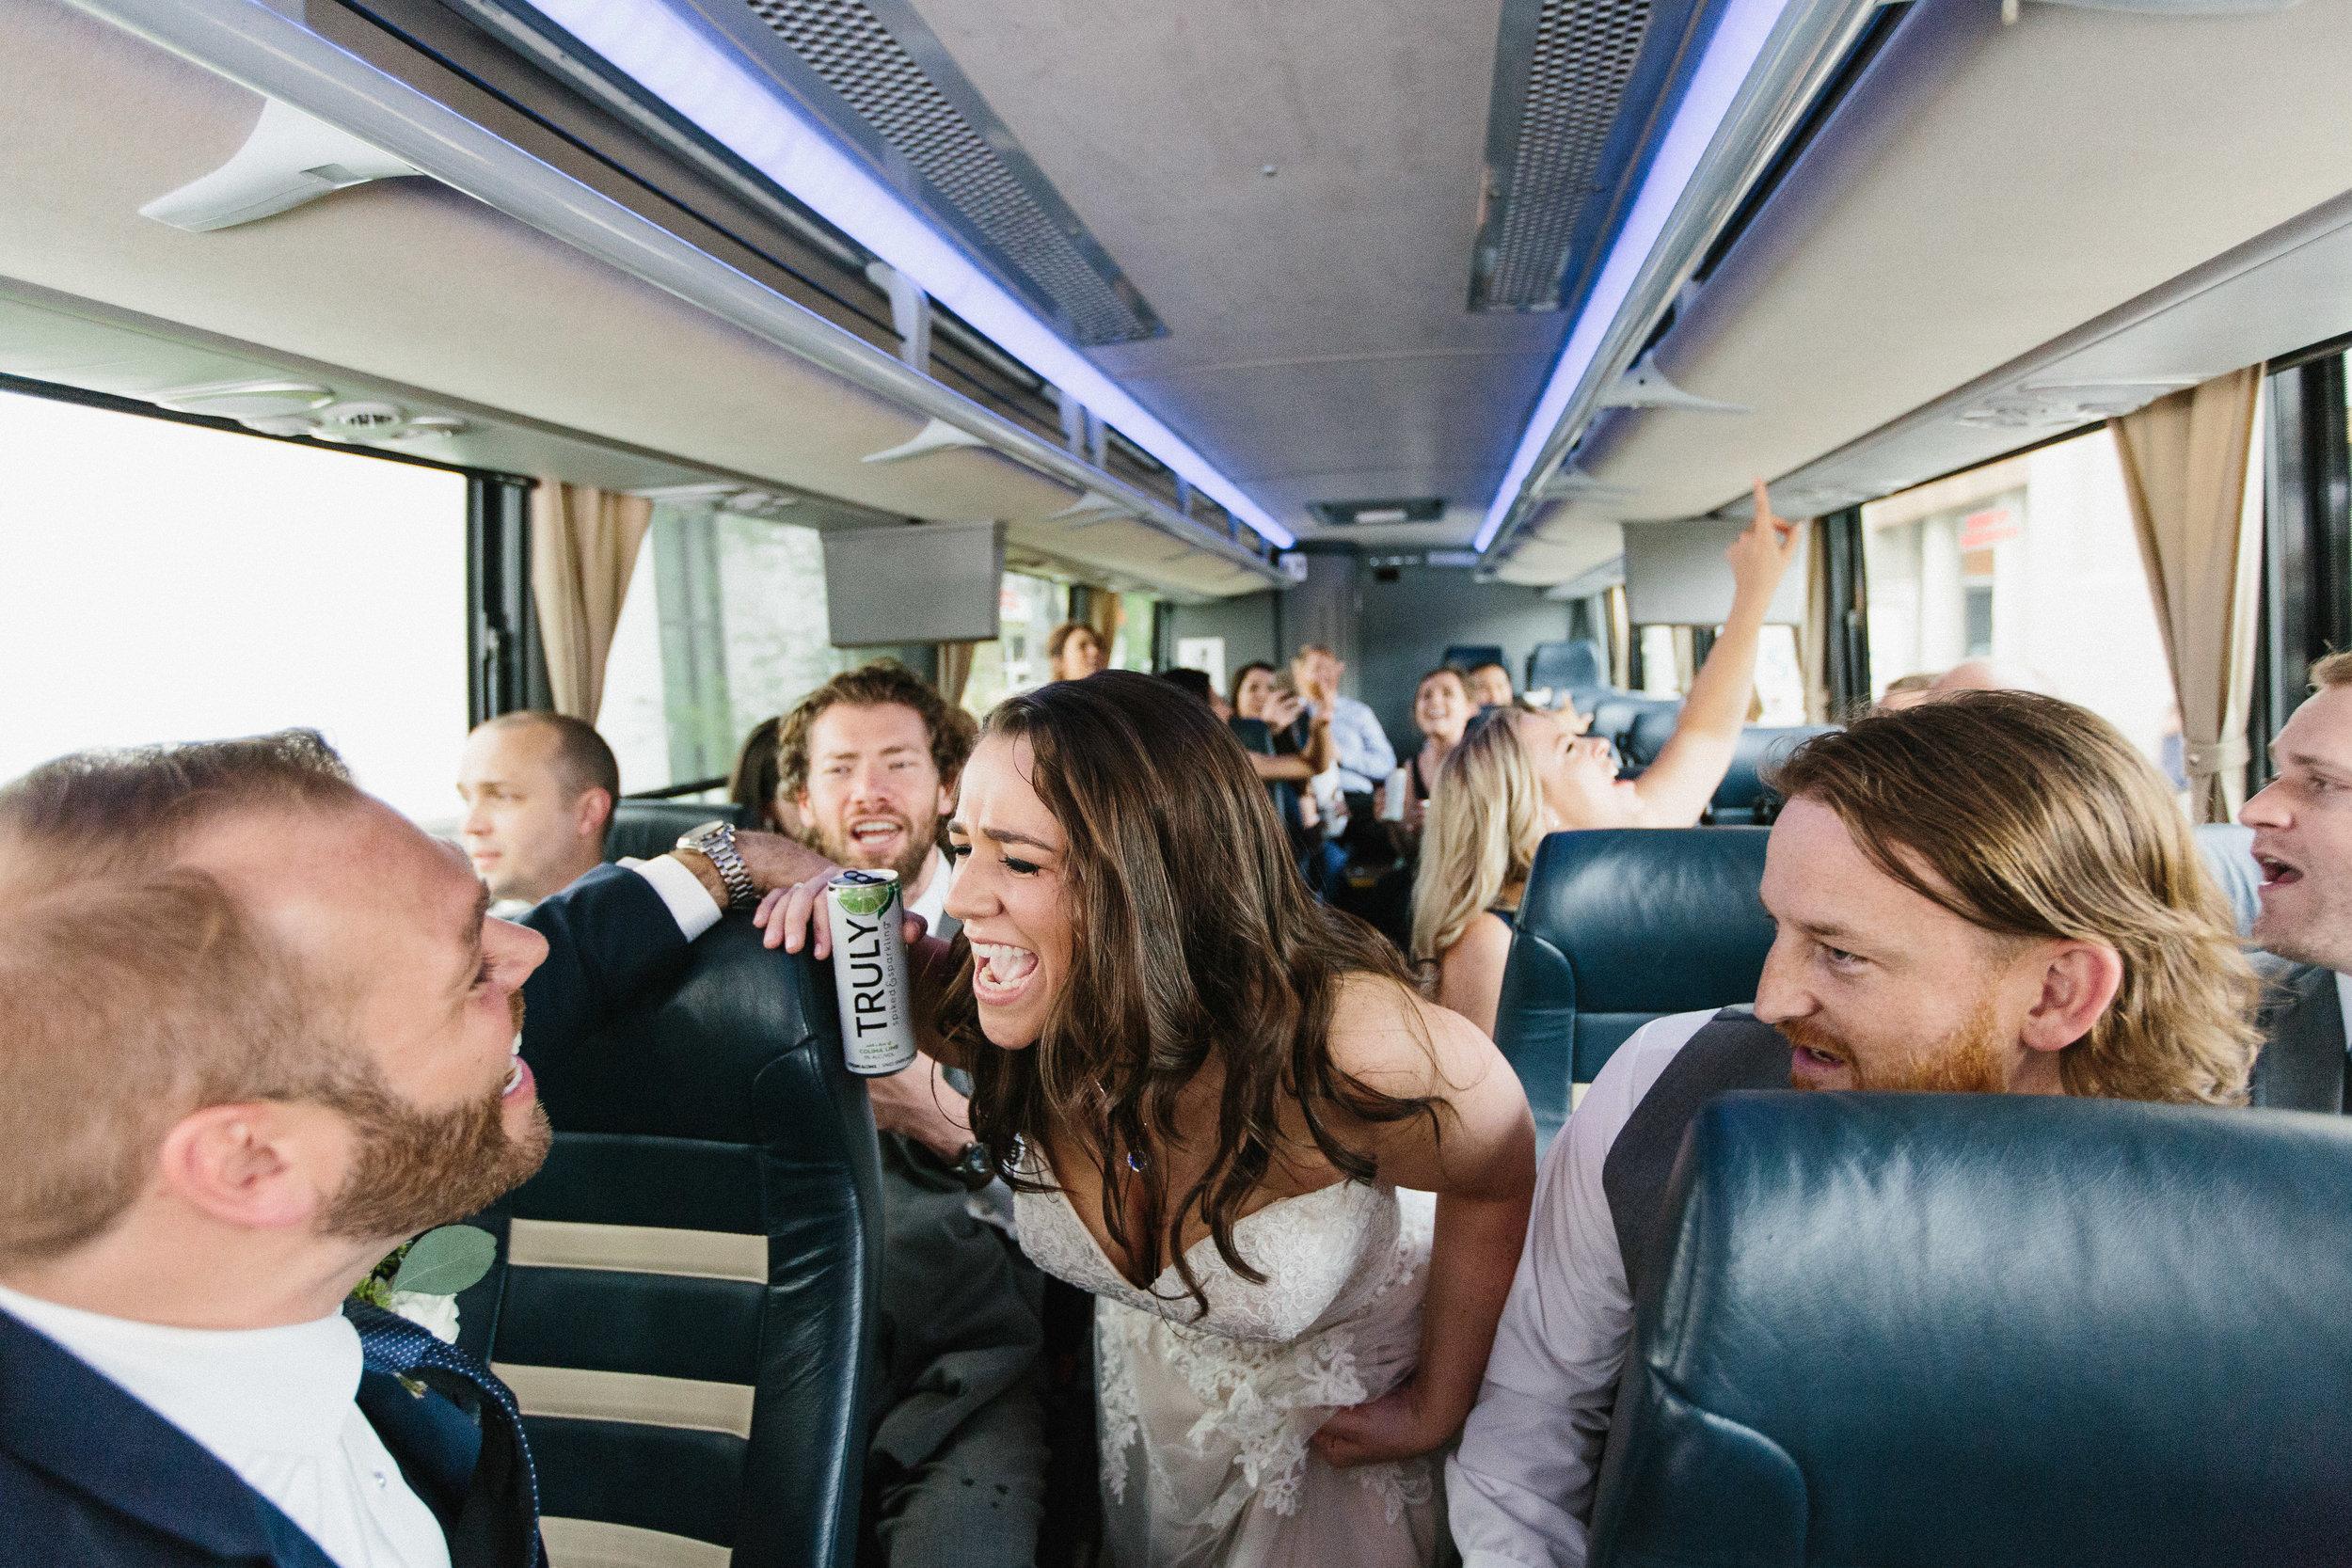 roswell_st_peter_chanel_catholic_avalon_hotel_alpharetta_wedding-1812.jpg